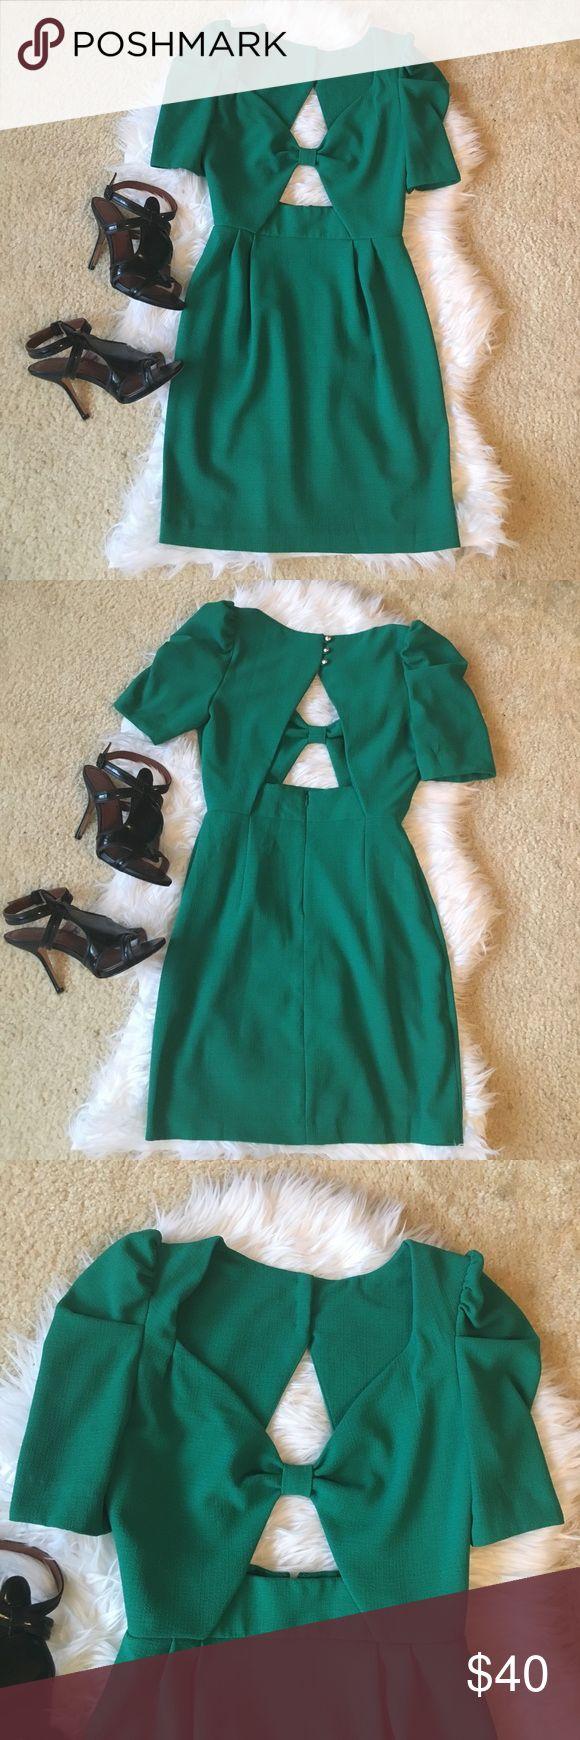 ASOS Cocktail Dress Brand new, unworn. Bust: 34 inches Waist: 26 inches Sleeve: 11 inches Length: 33 inches Asos Dresses